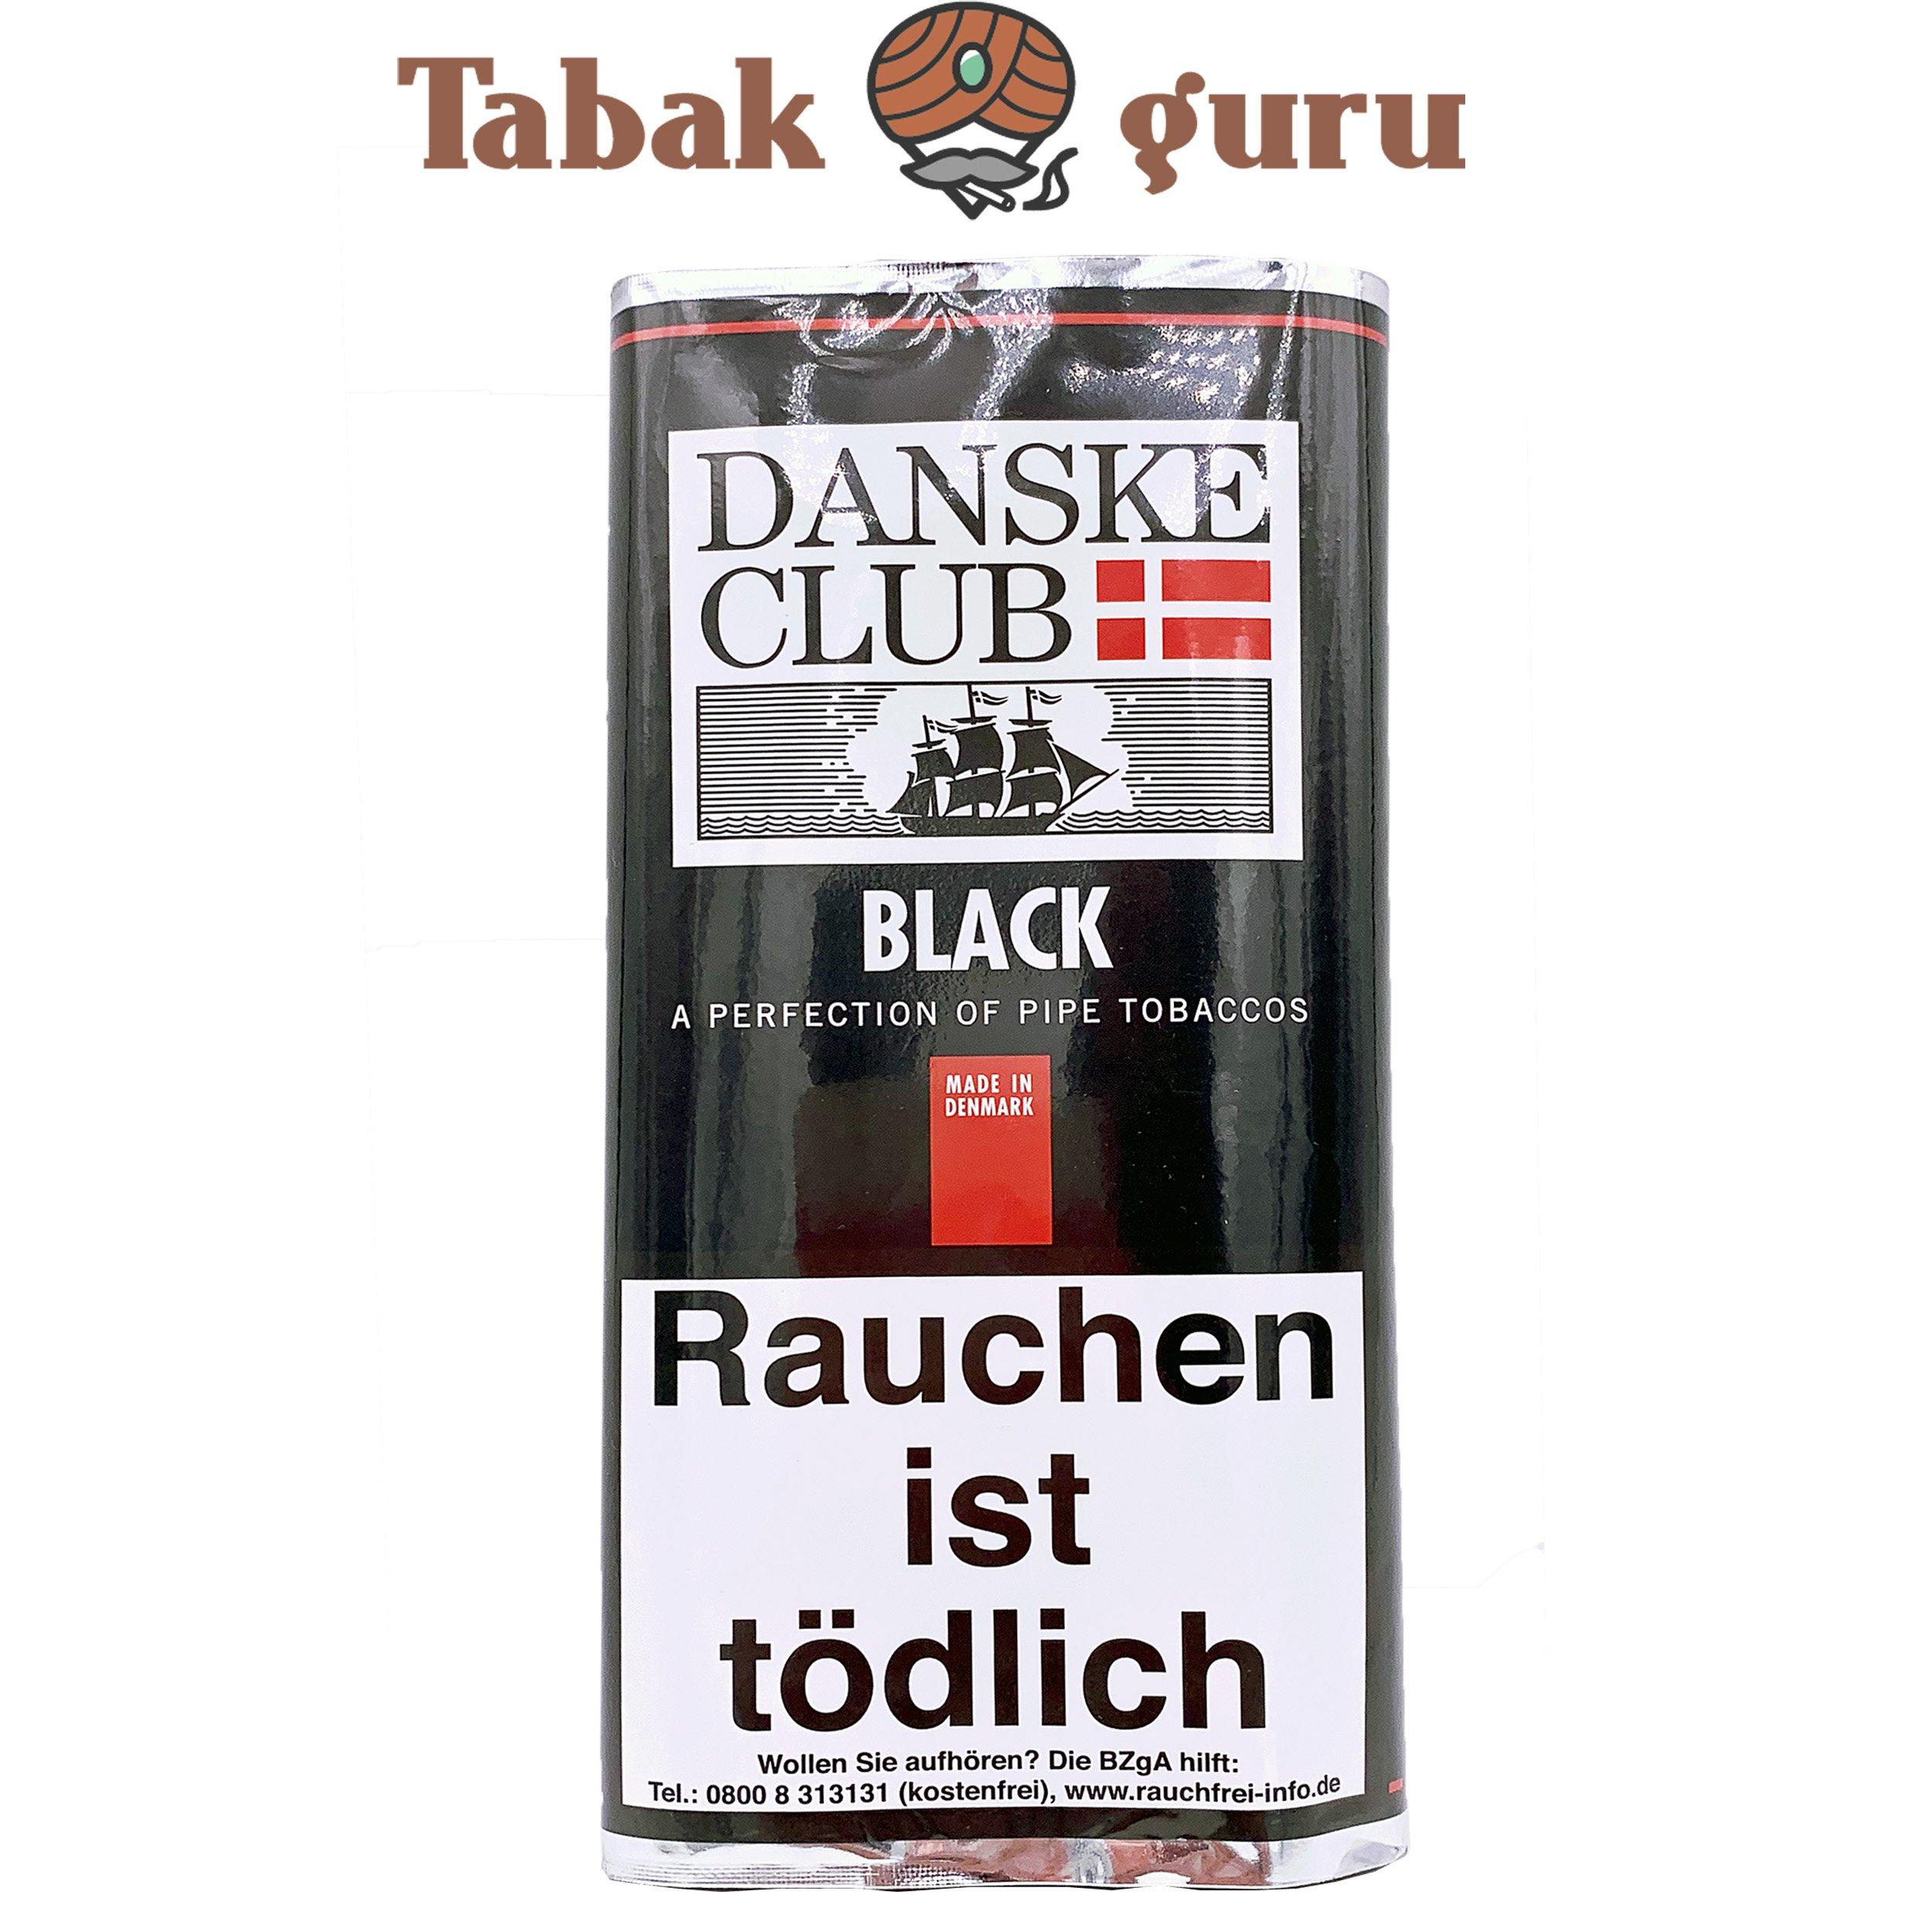 Danske Club Black Pfiefentabak